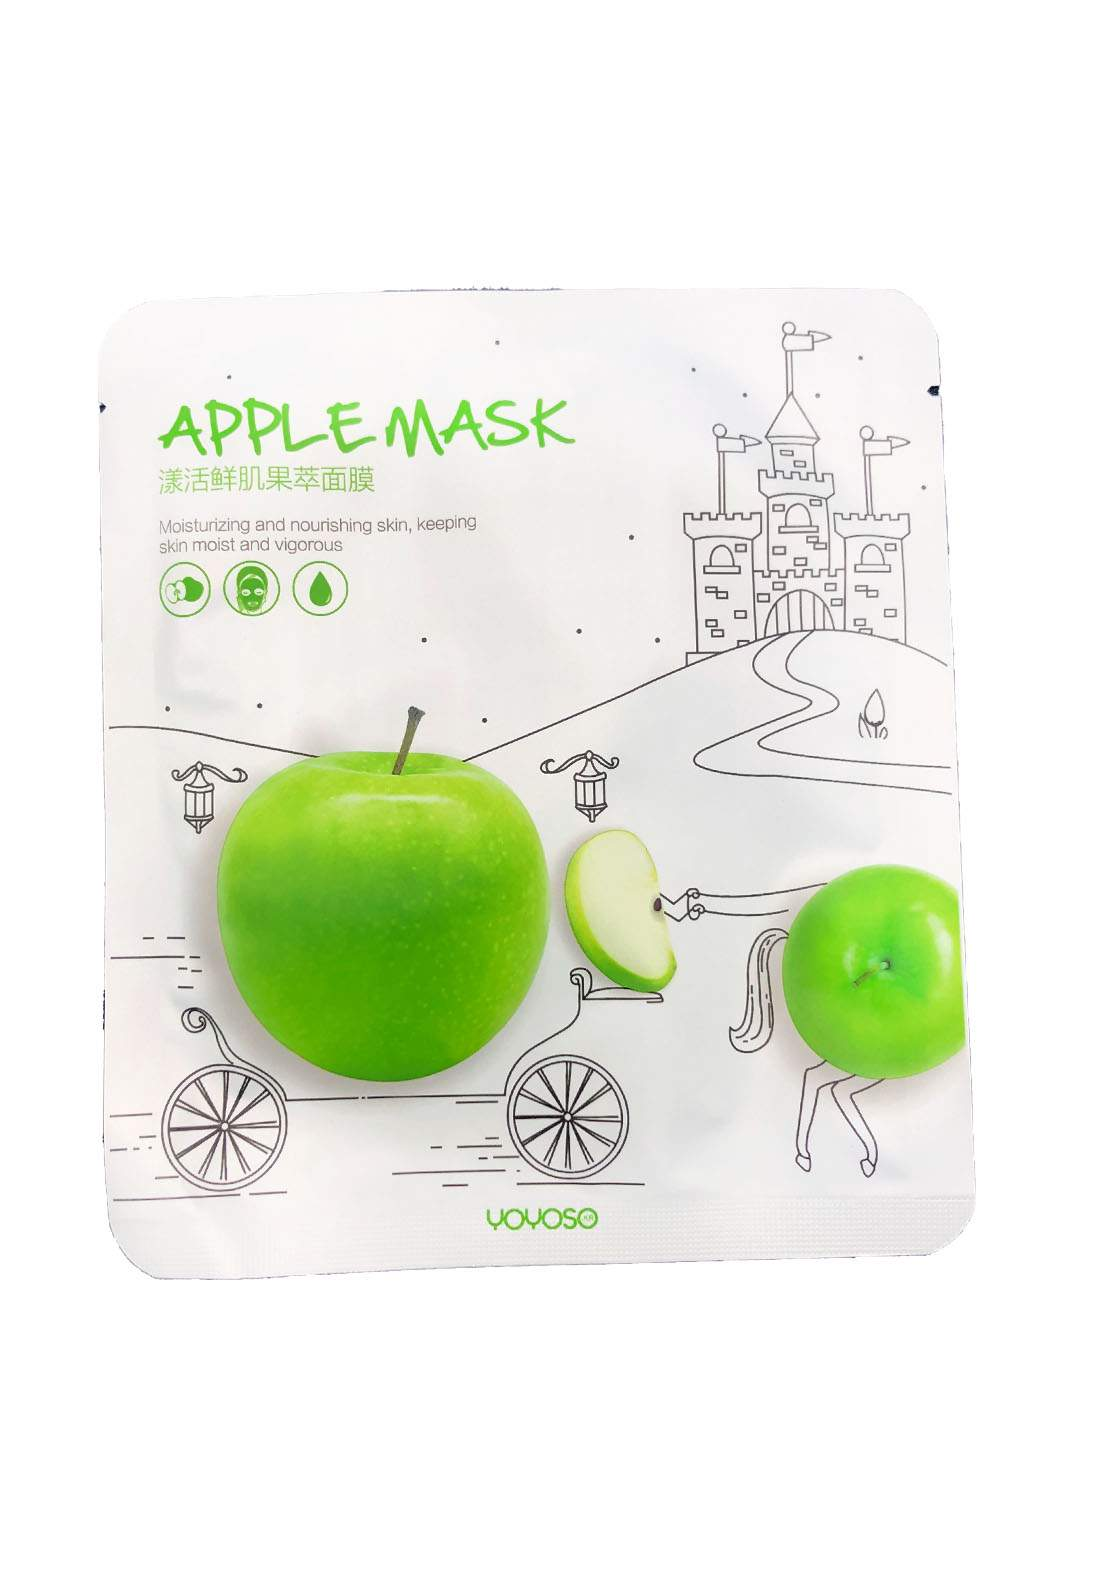 Yoyo So Apple Mask ماسك للوجه